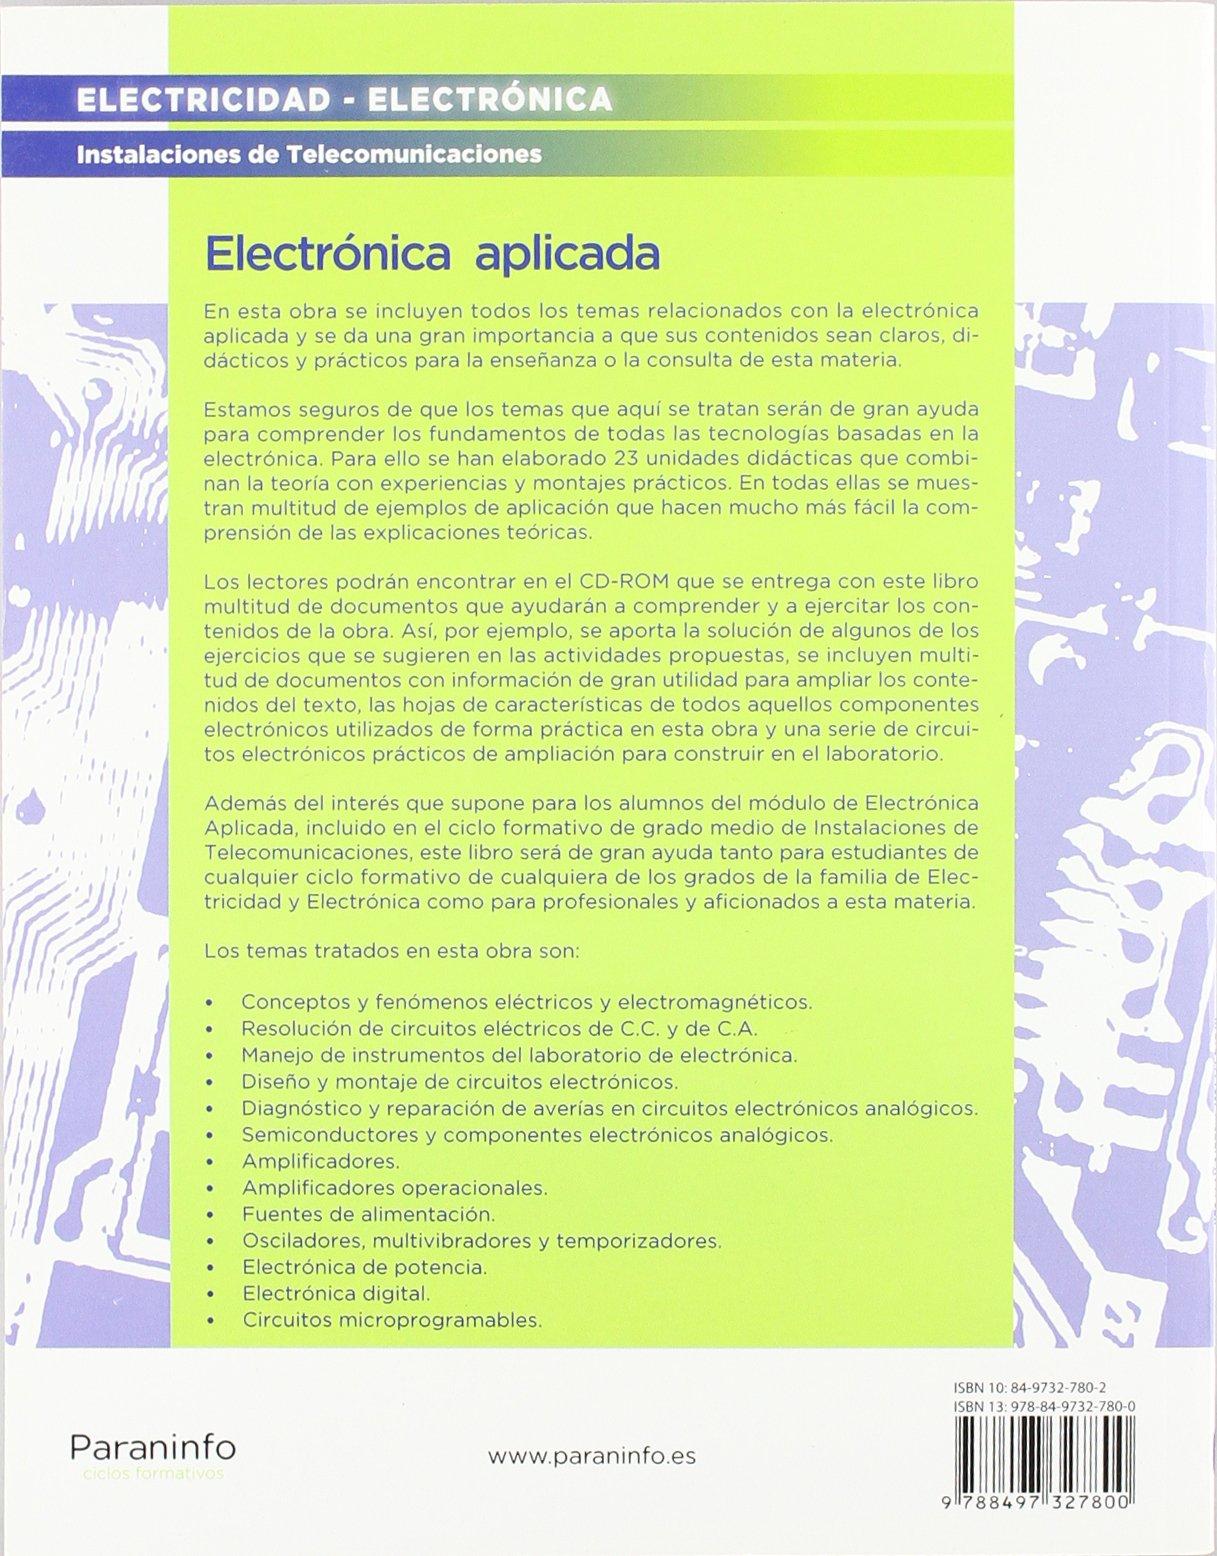 ELECTRONICA APLICADA (NUEVO 2010): Varios: 9788497327800: Amazon.com: Books